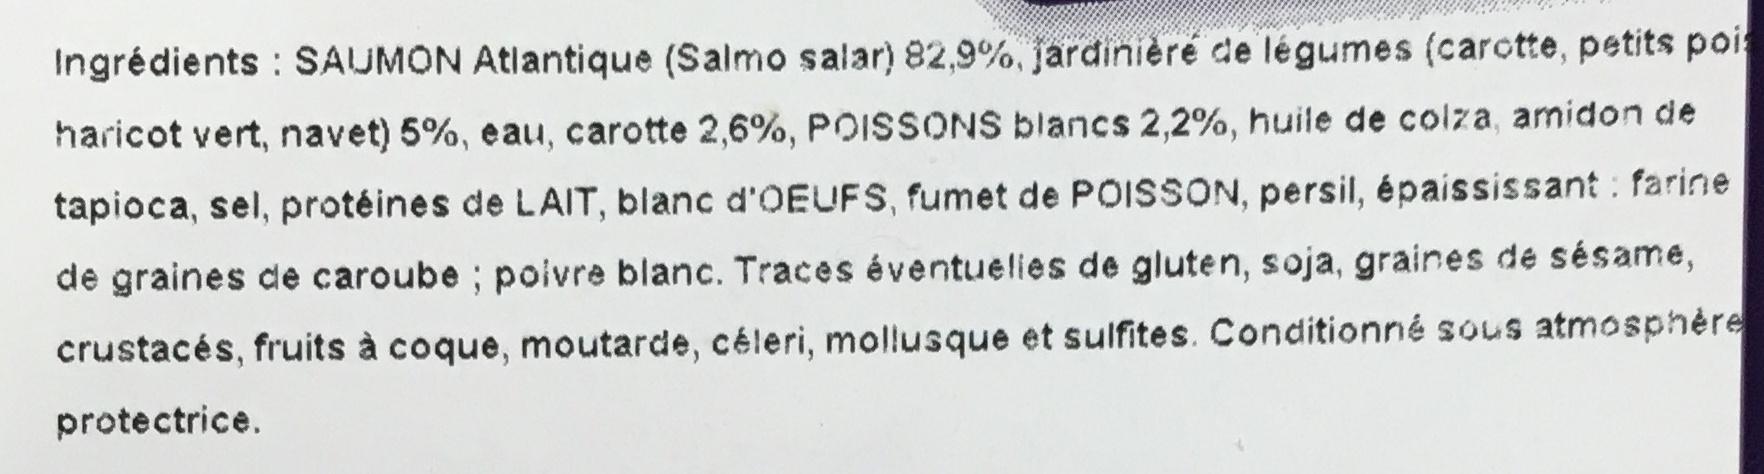 Darne de saumon label rouge farci - Ingredients - fr